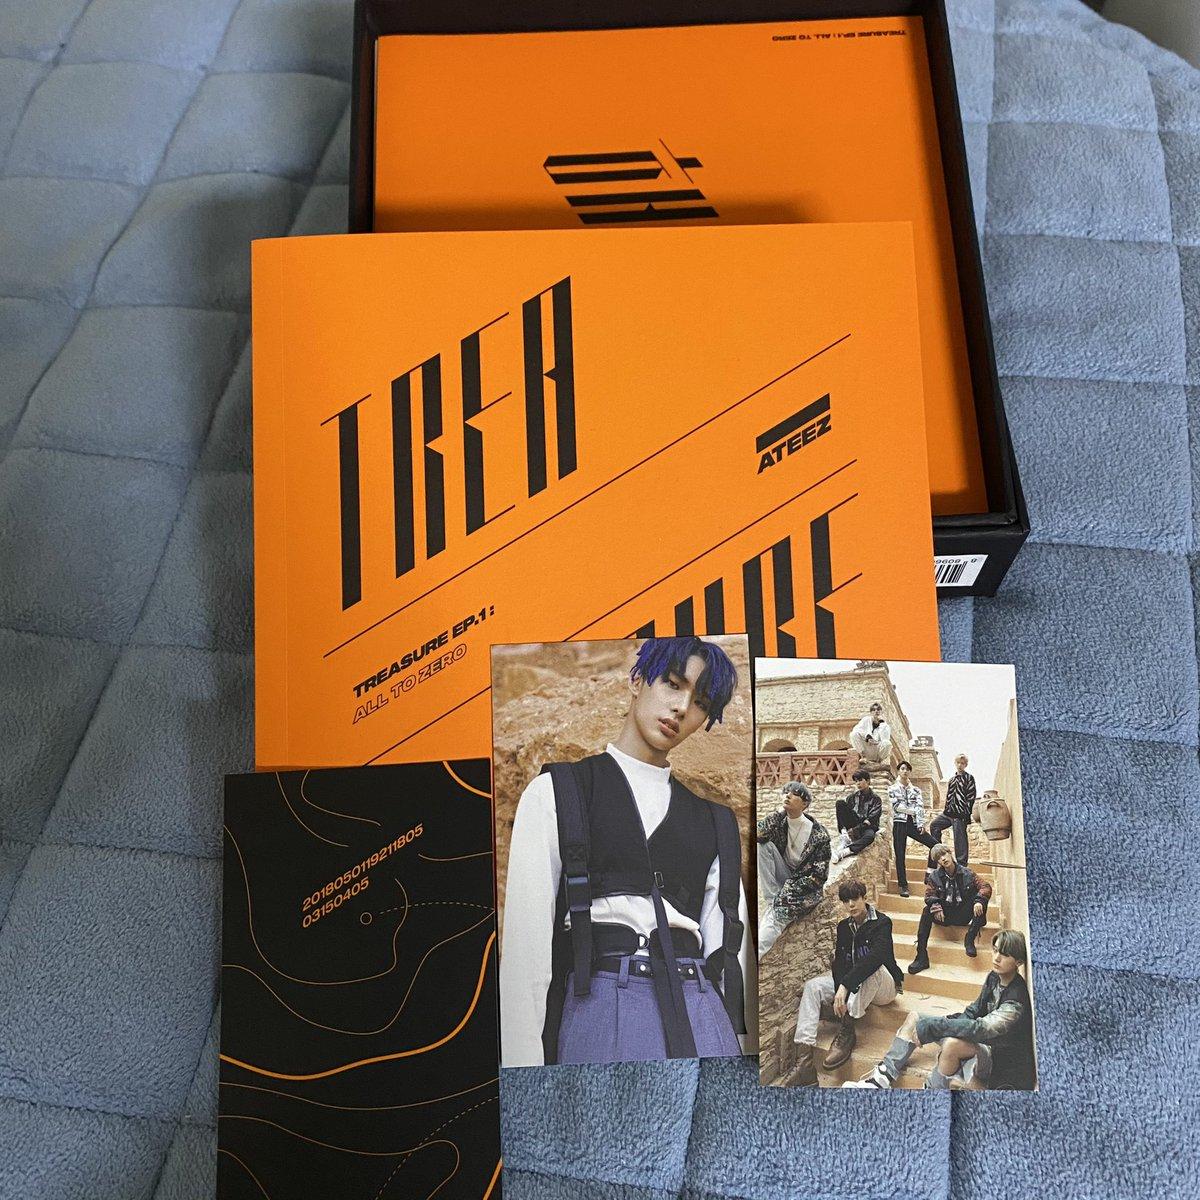 Selling #ATEEZ Treasure albums with PCs (see pics) #San #Wooyoung #Mingi #Treasure #ATINY #에이티니    디엠주세요   #에이티즈 #김홍중 #박성화 #정윤호 #강여상 #최산 #송민기 #정우영 #최종호 #양도